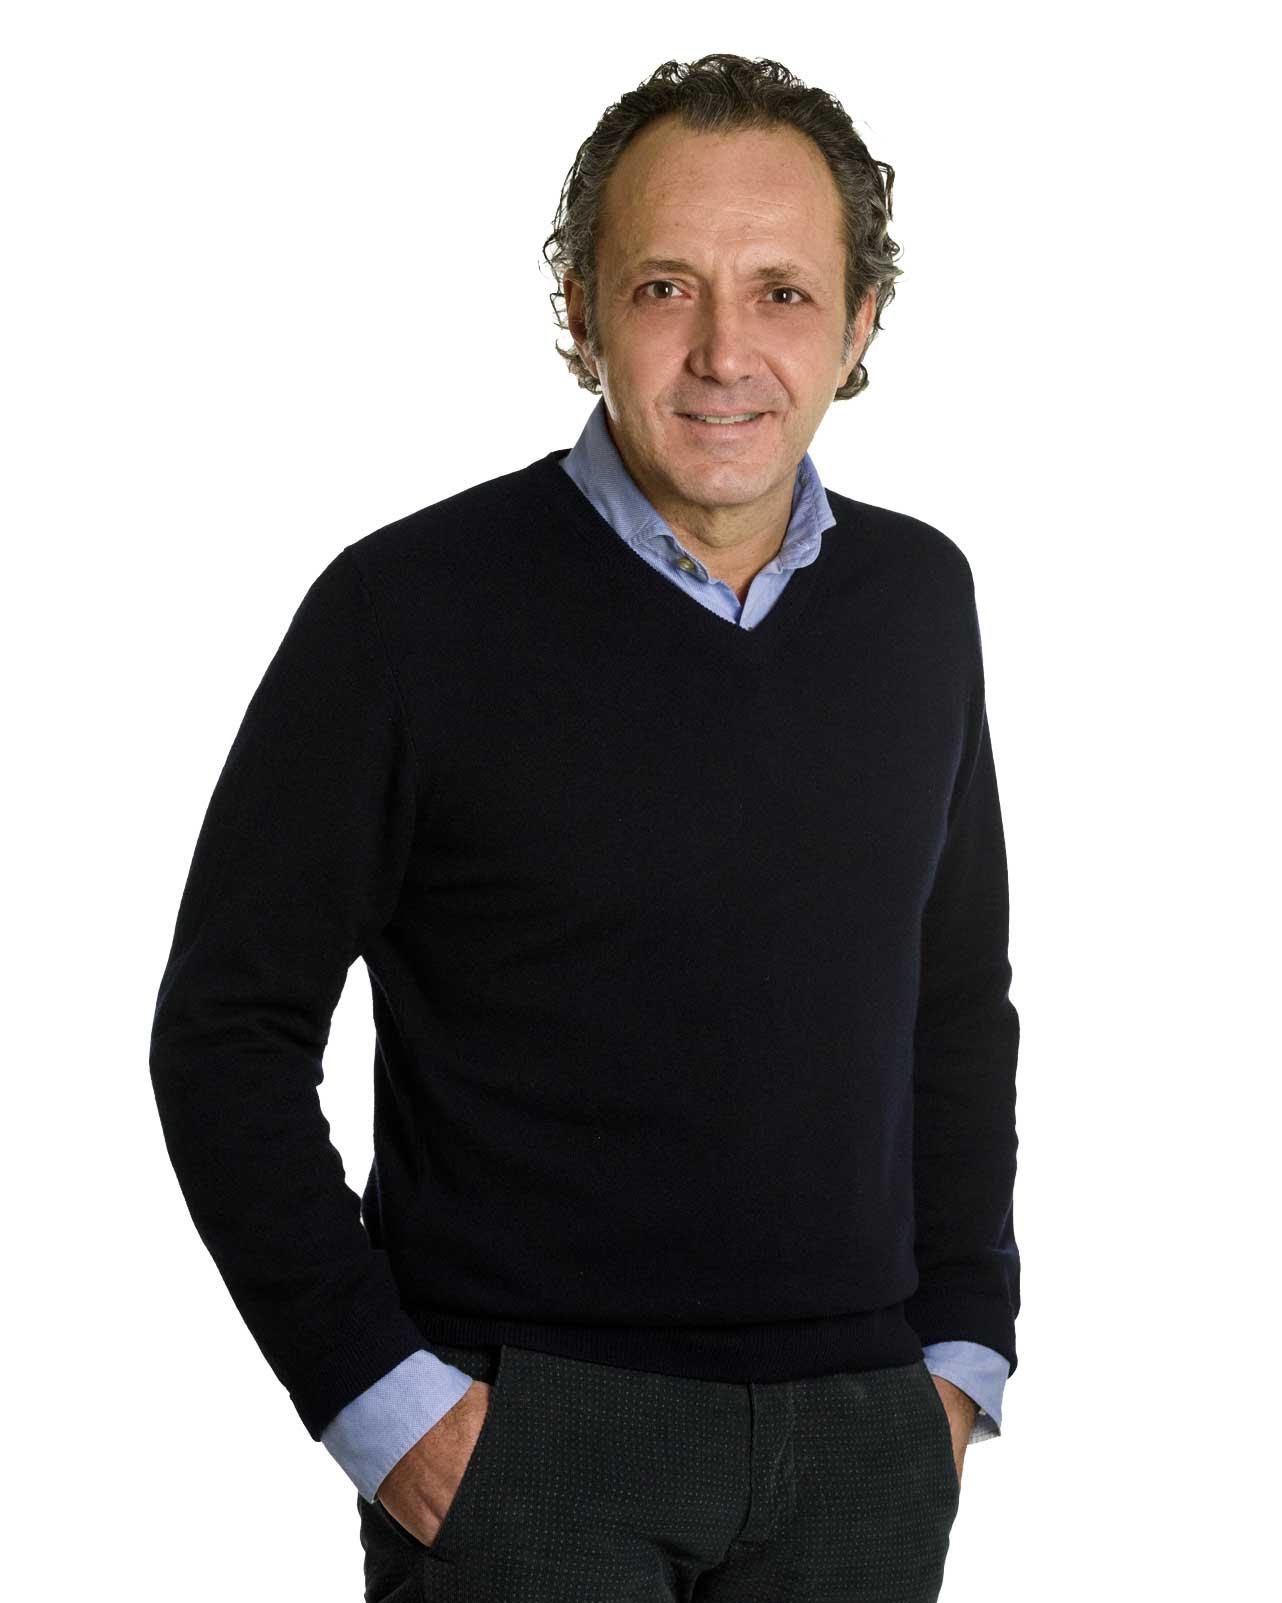 Gian Luca Zanoni